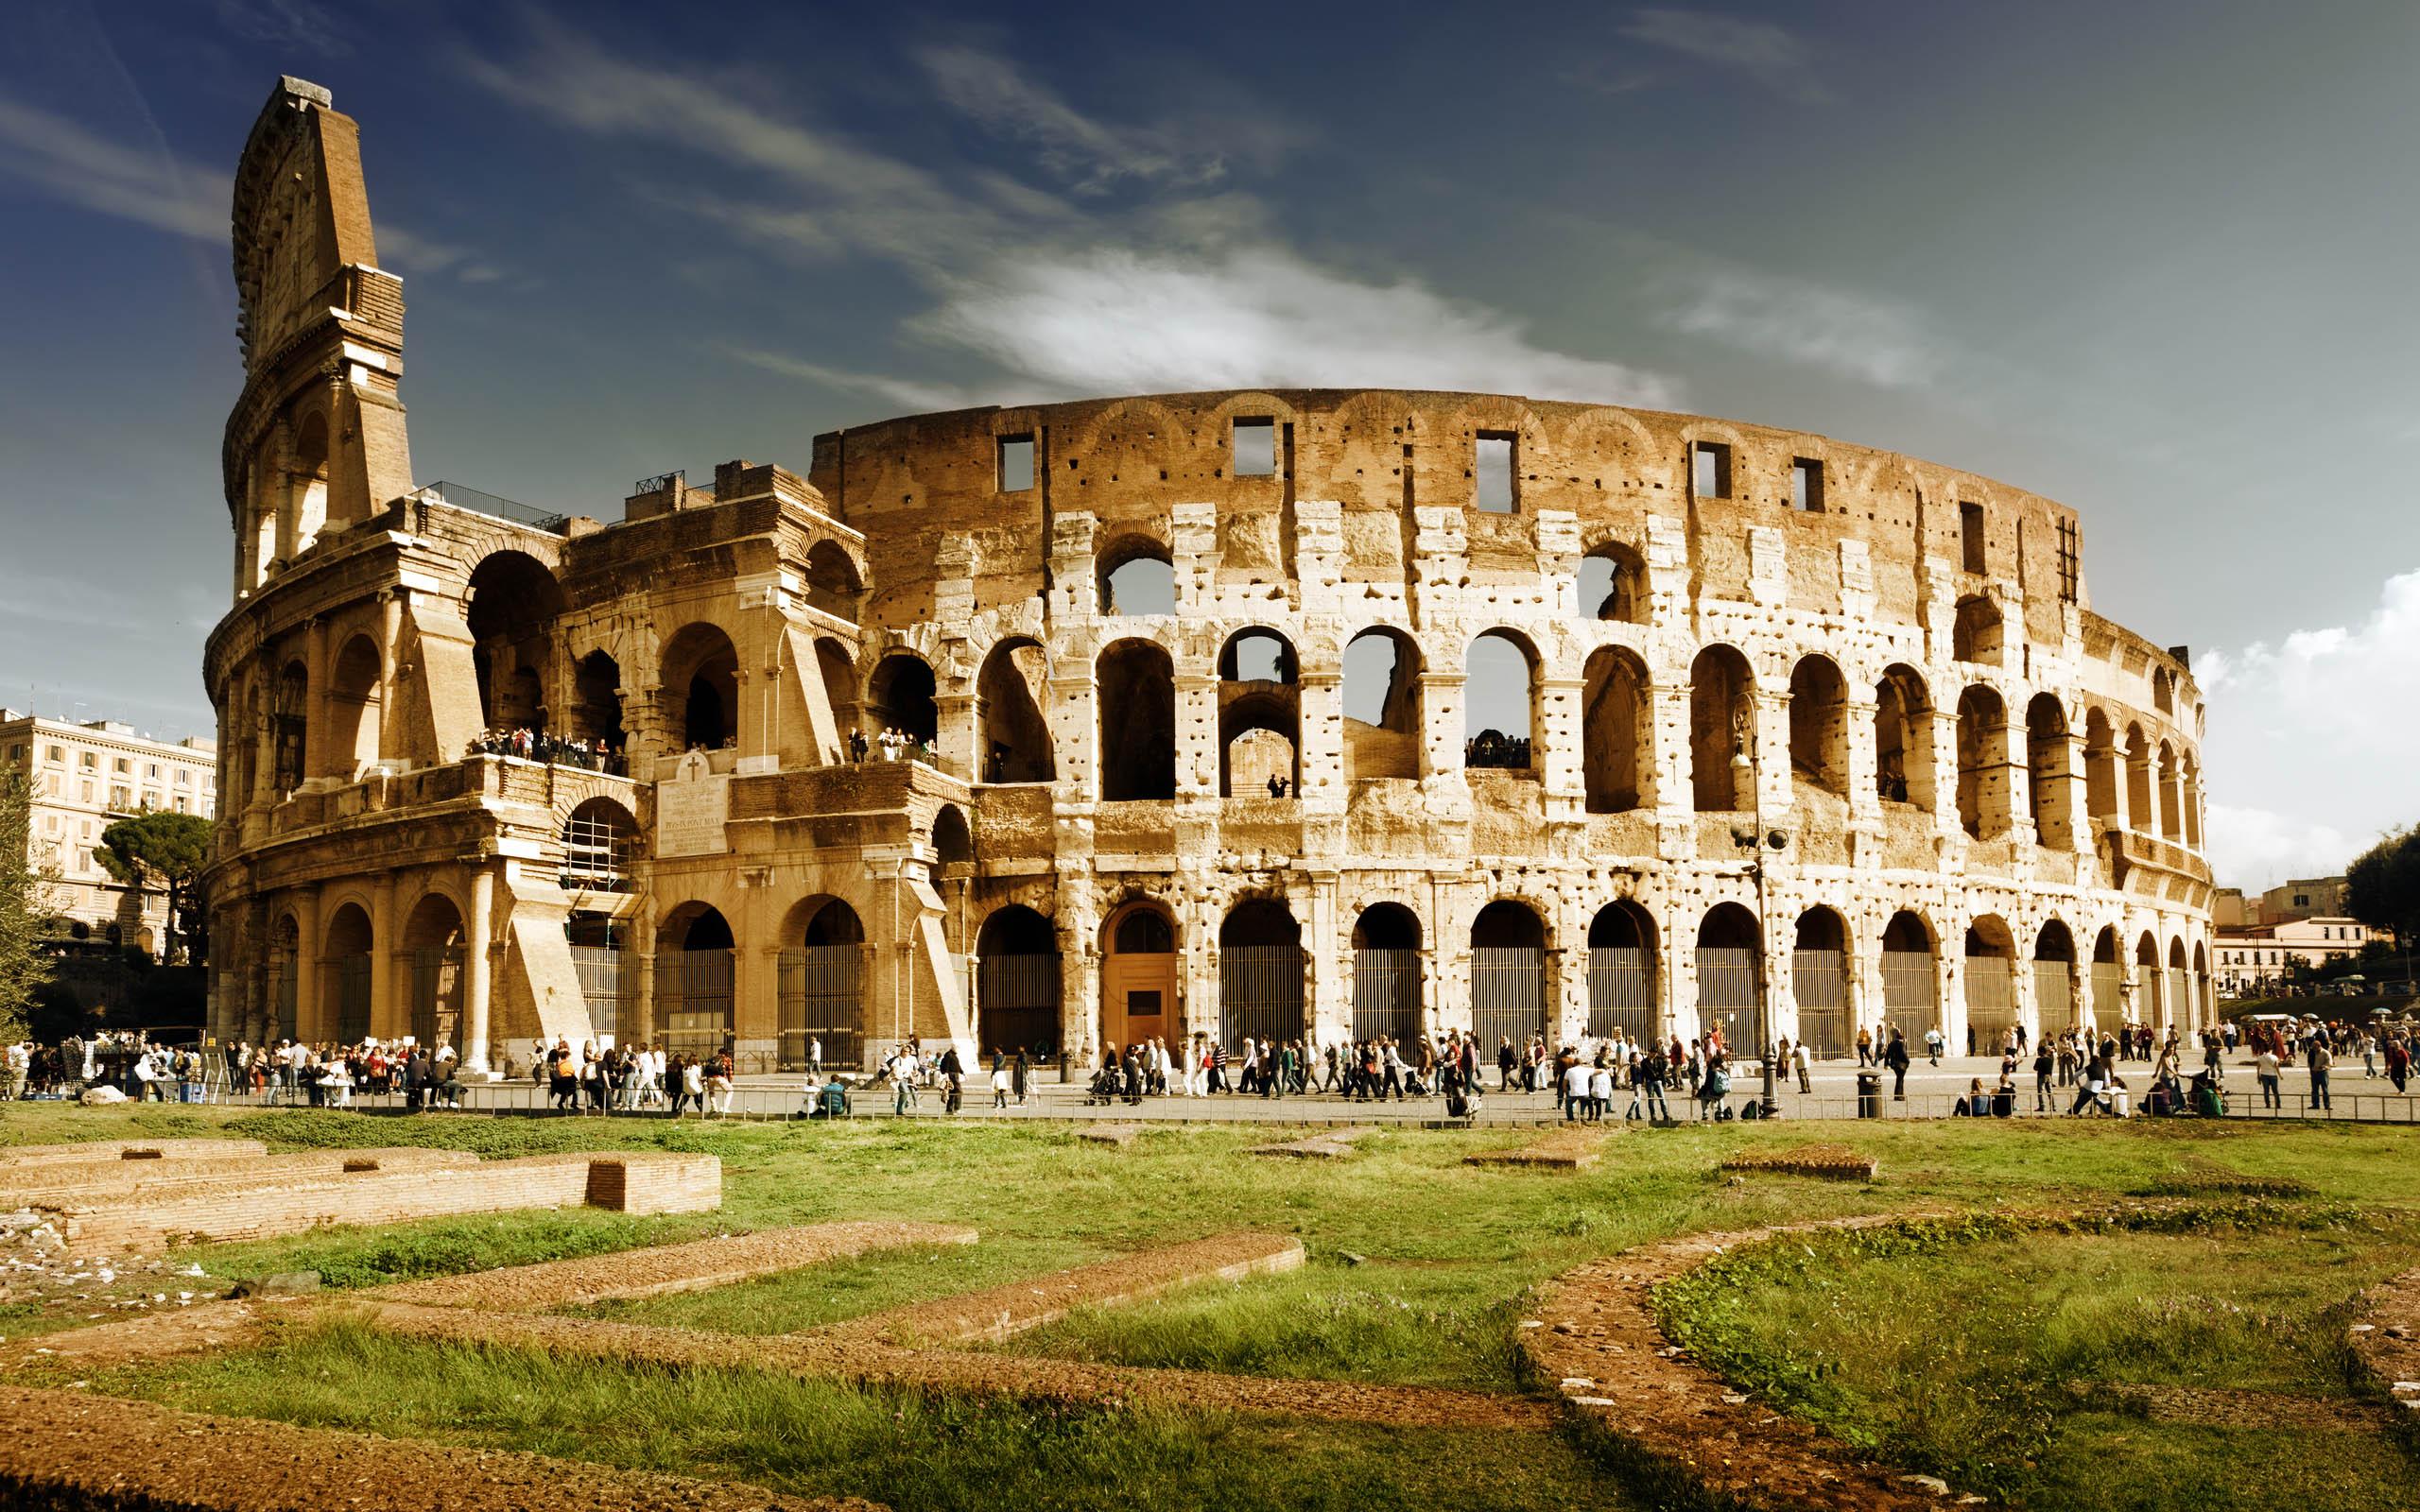 colosseum-taly-rome-landscape1